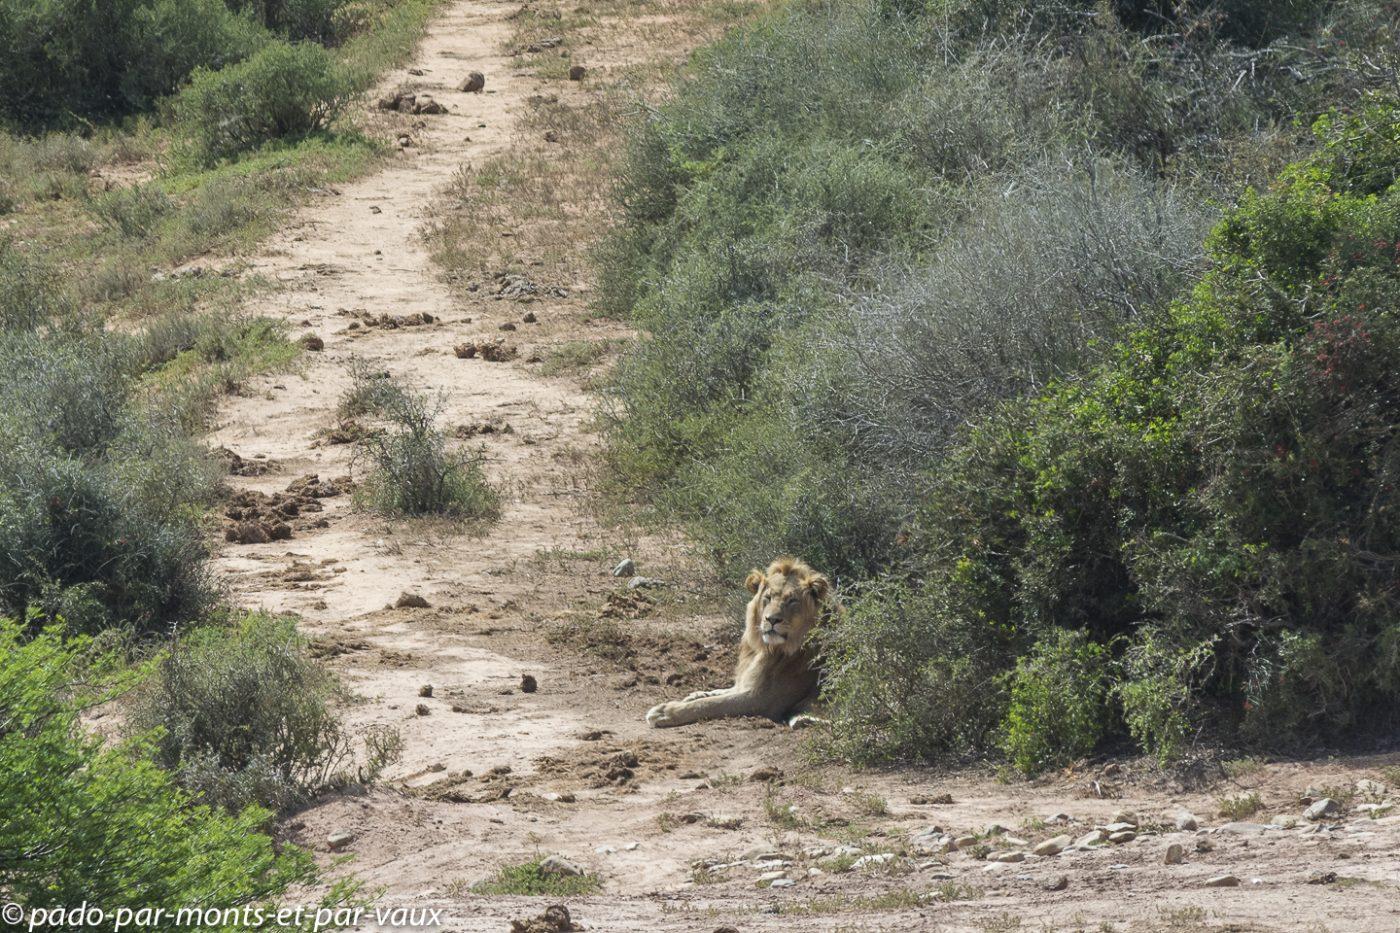 Addo Elephant NP - Lion